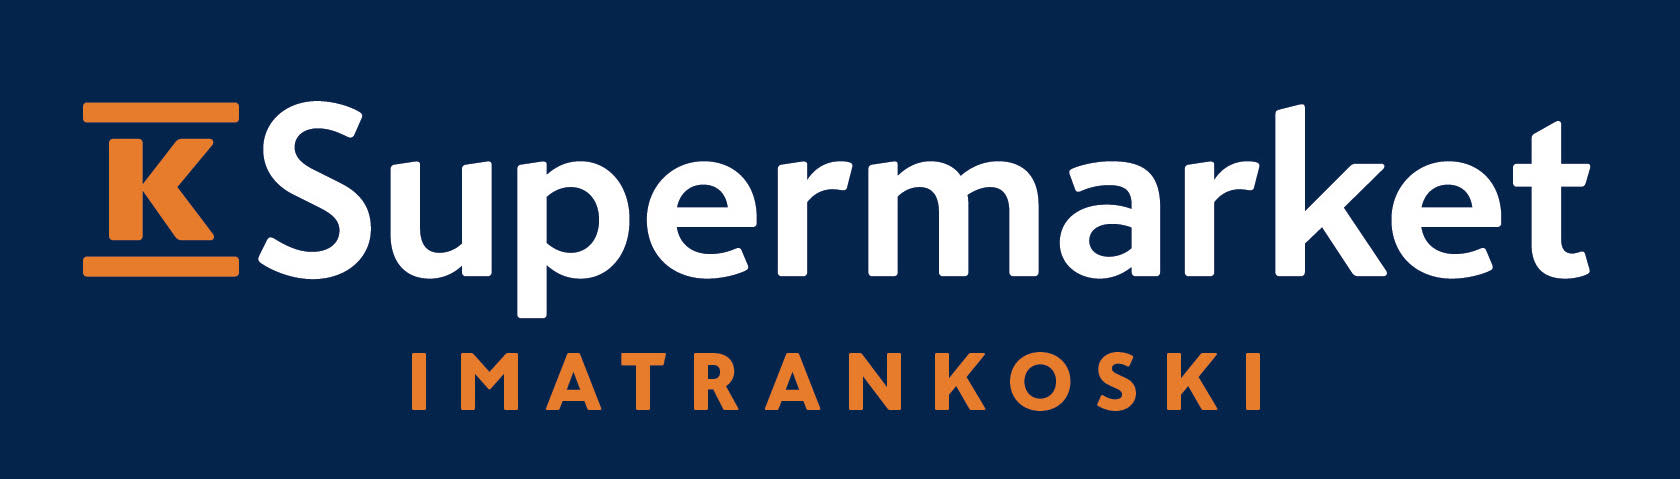 K Supermarket Imatrannkoski